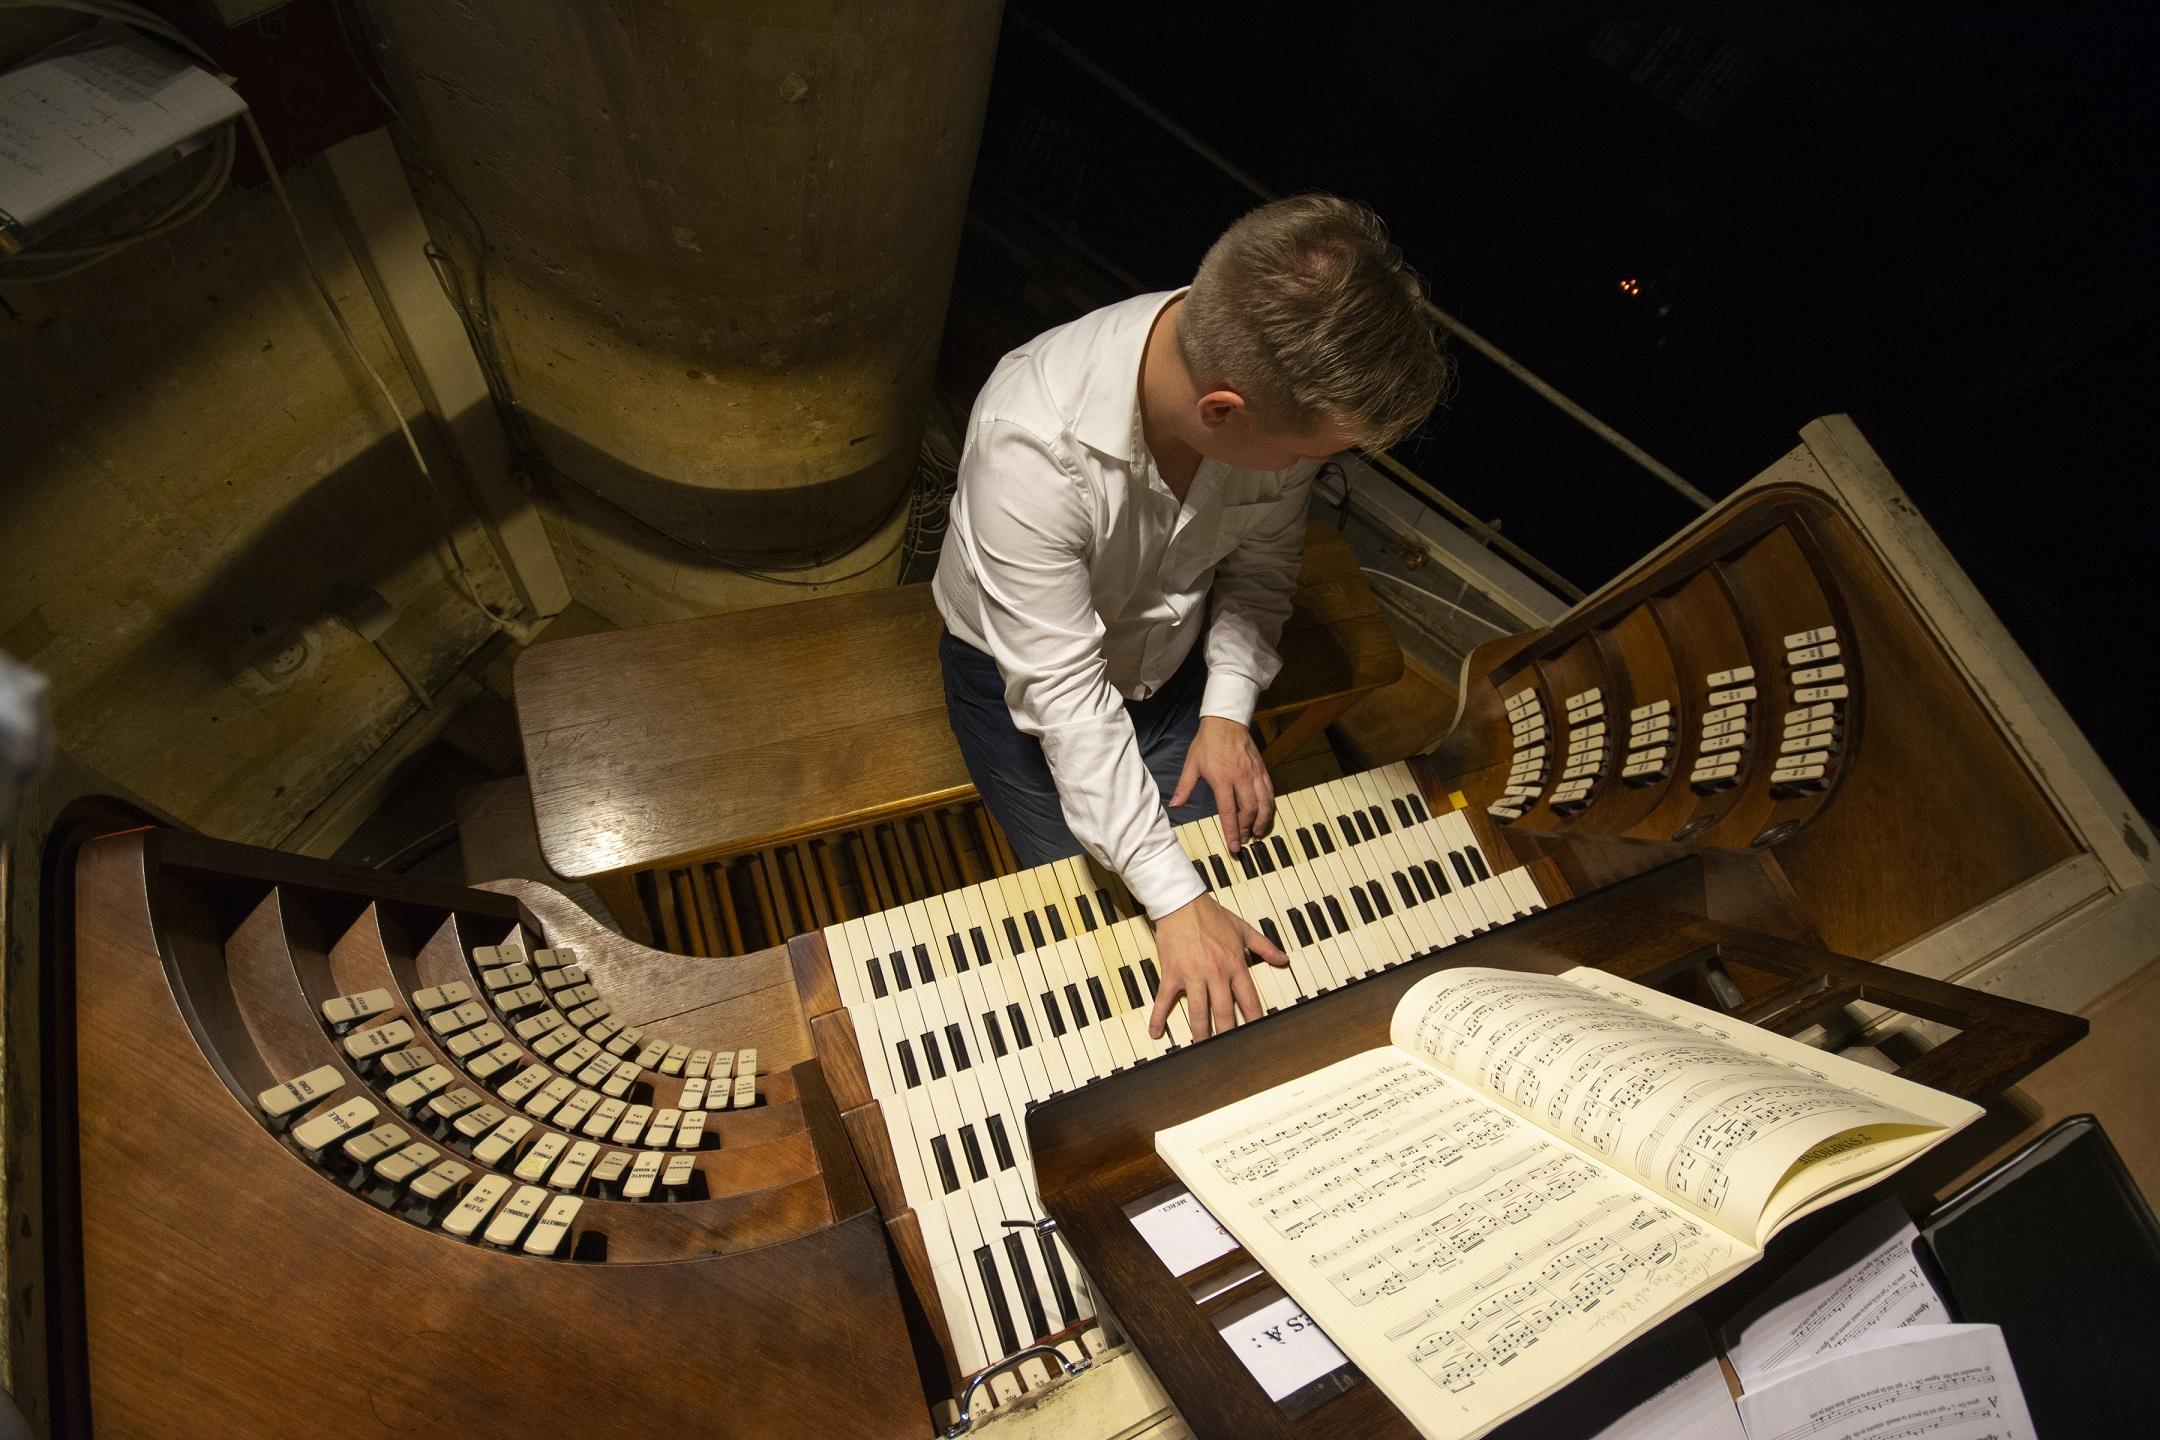 Oreli maagia I: Tallinna Filharmoonia 25